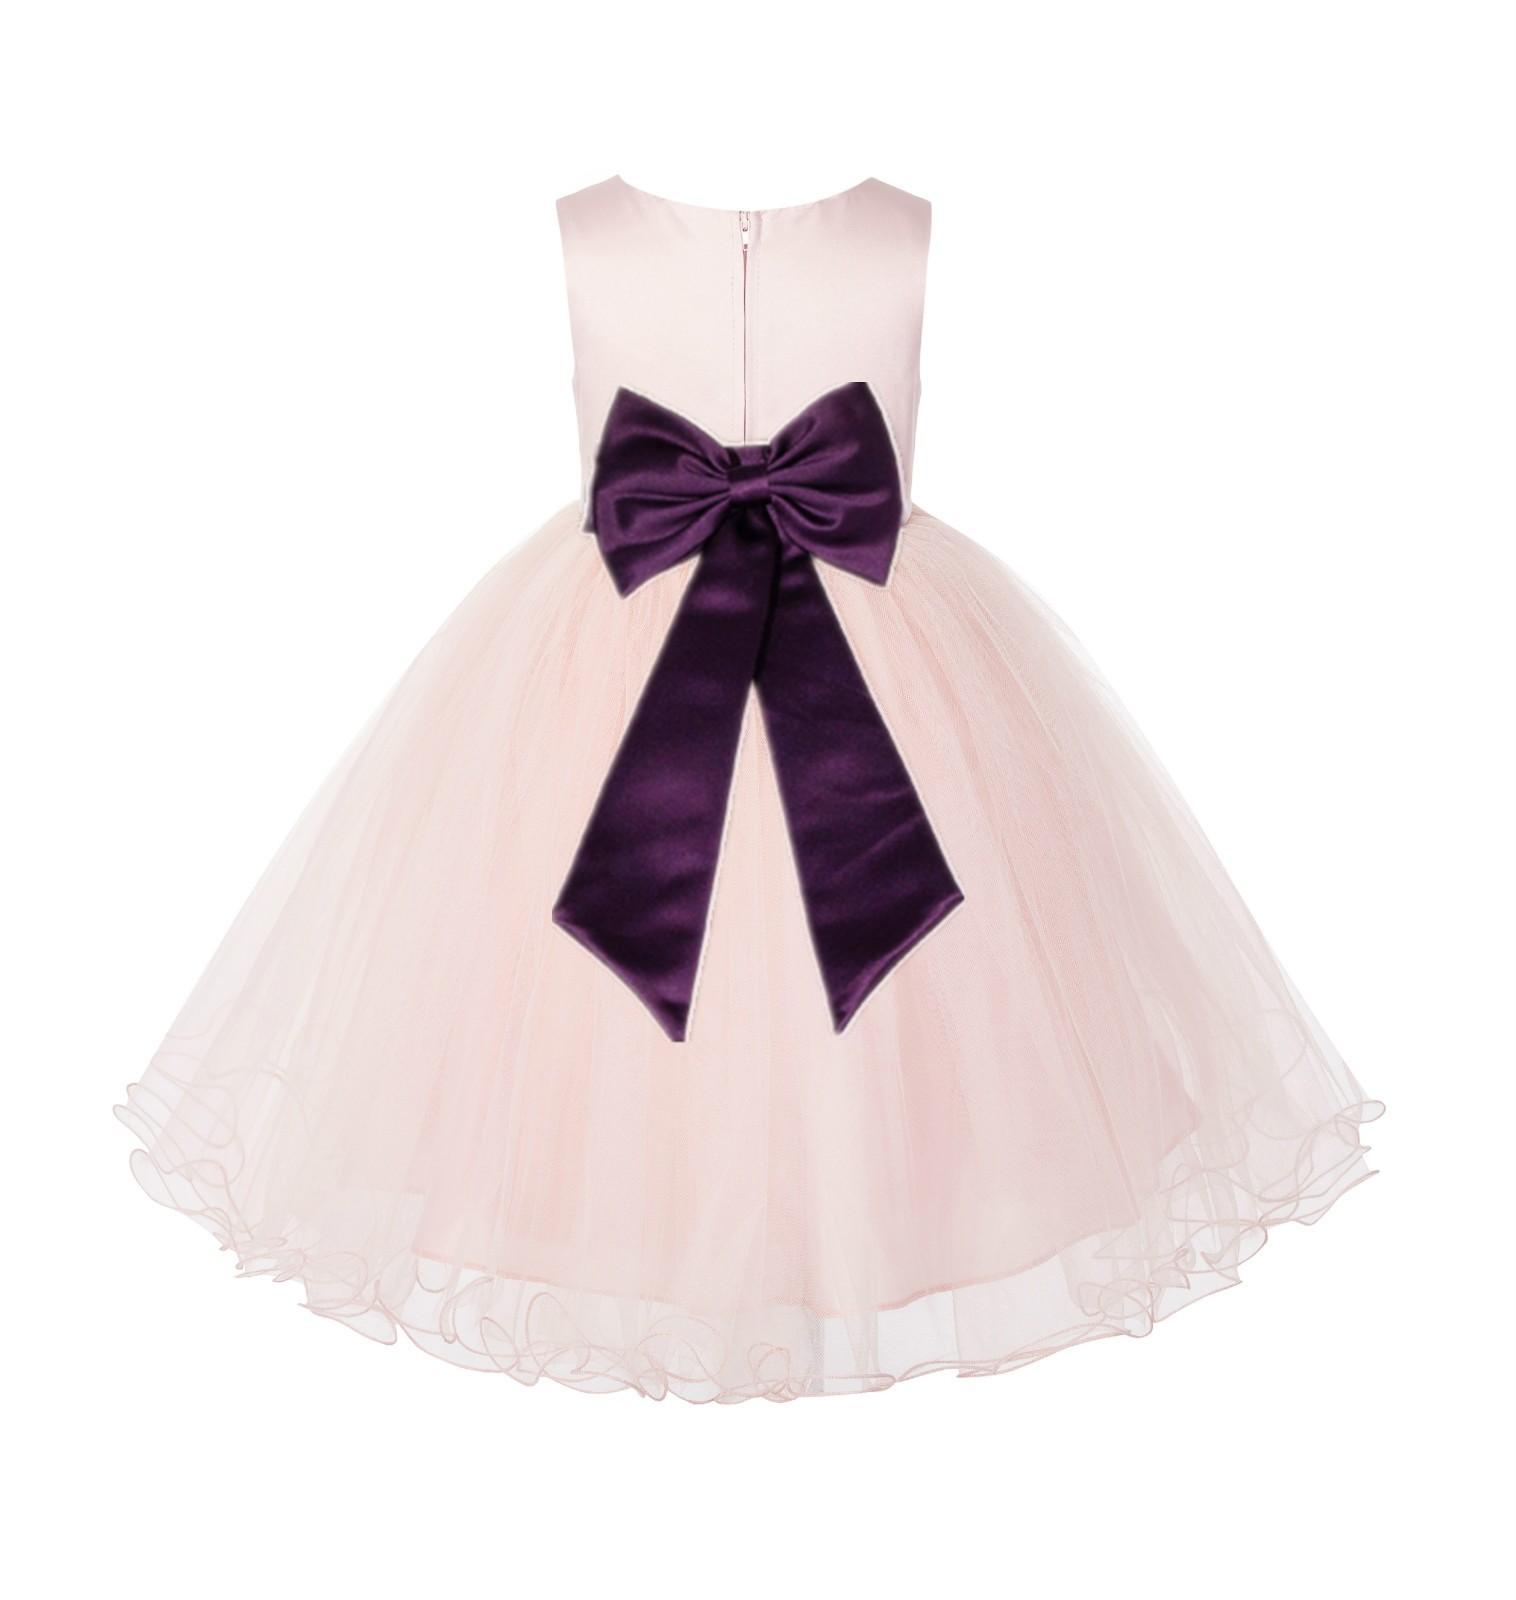 Blush PInk / Plum Tulle Rattail Edge Flower Girl Dress Wedding Bridesmaid 829T